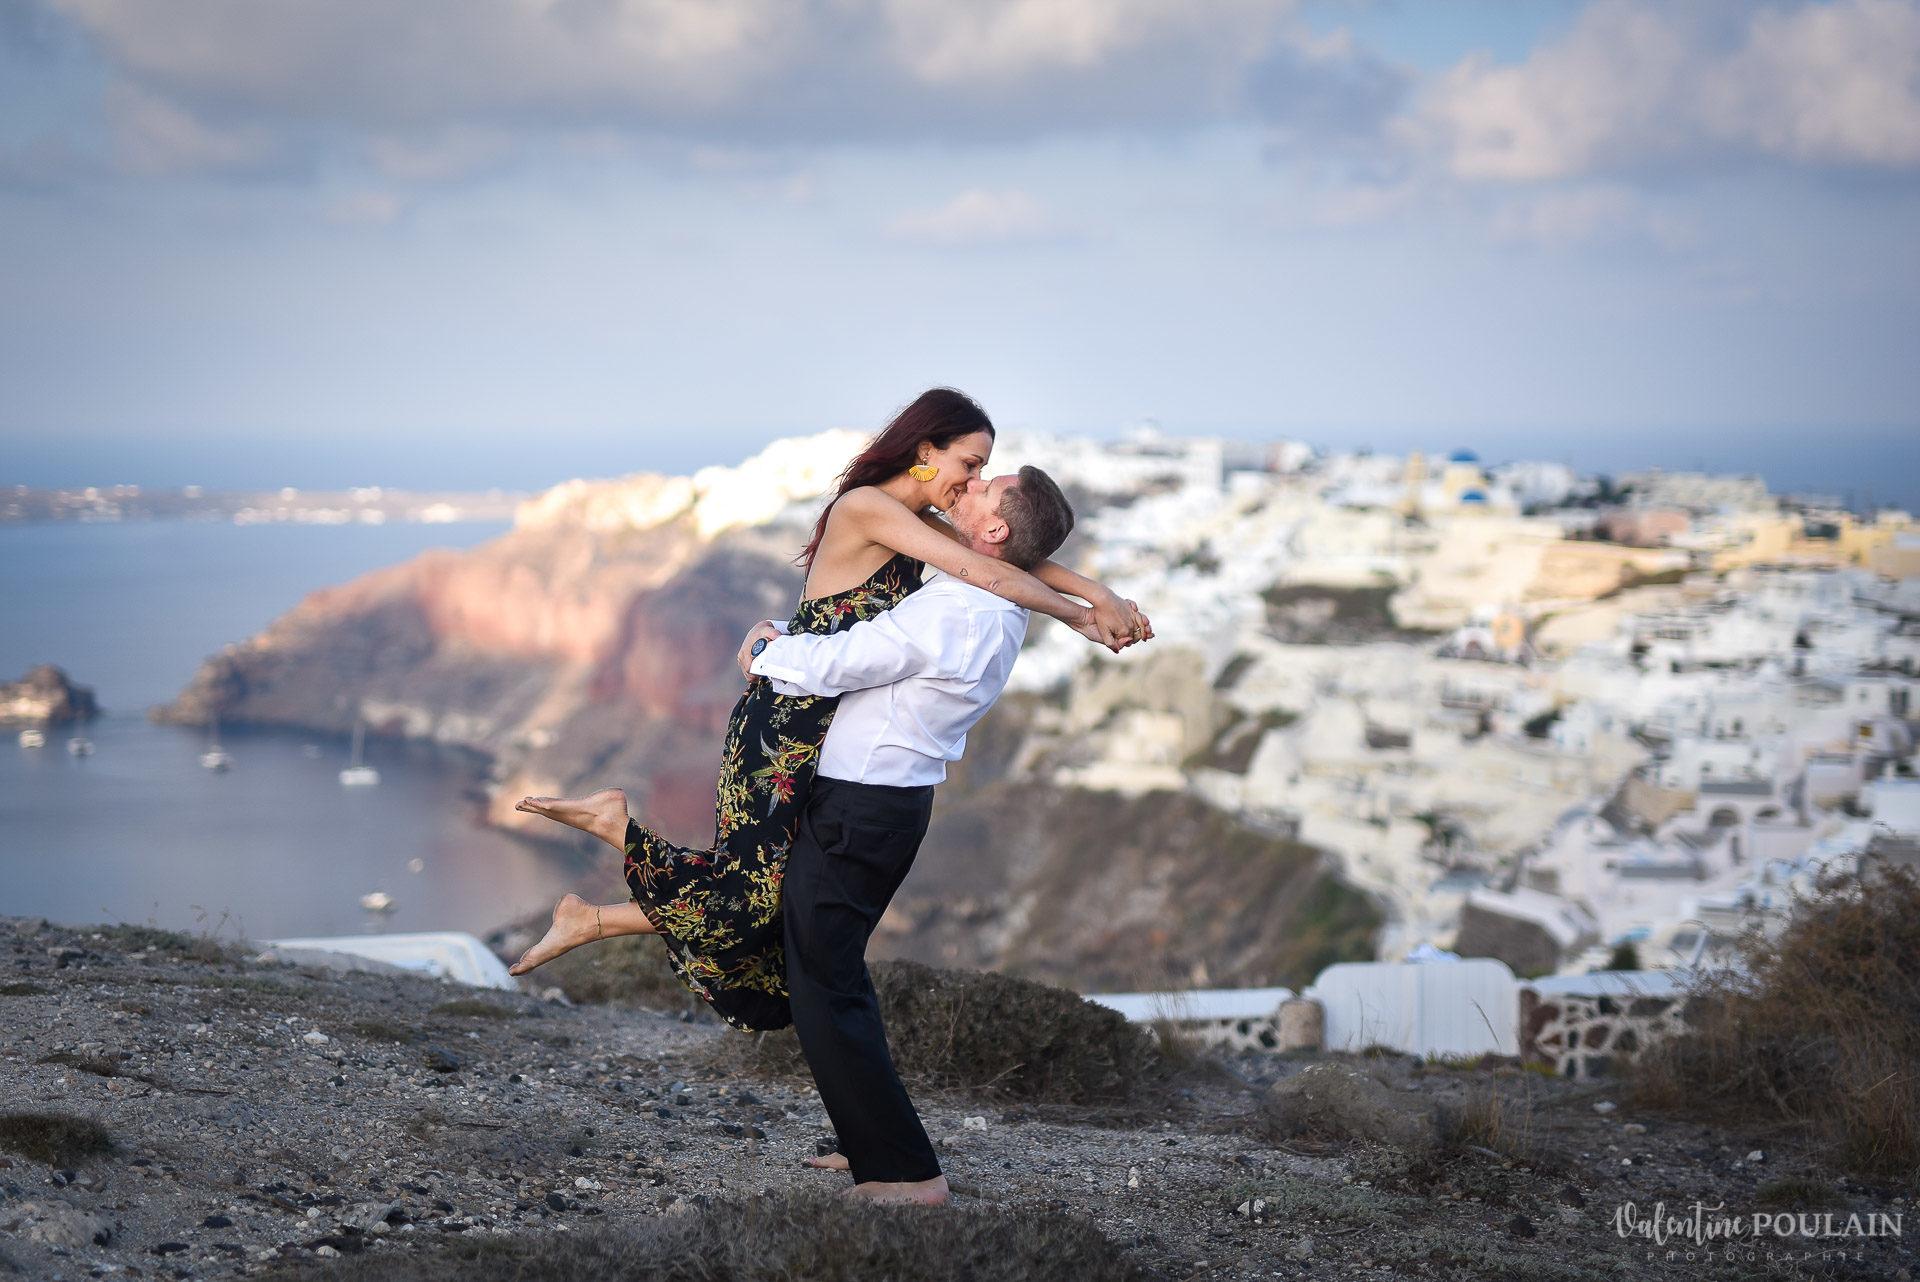 Shooting photo day after Santorin - Valentine Poulain hauteurs